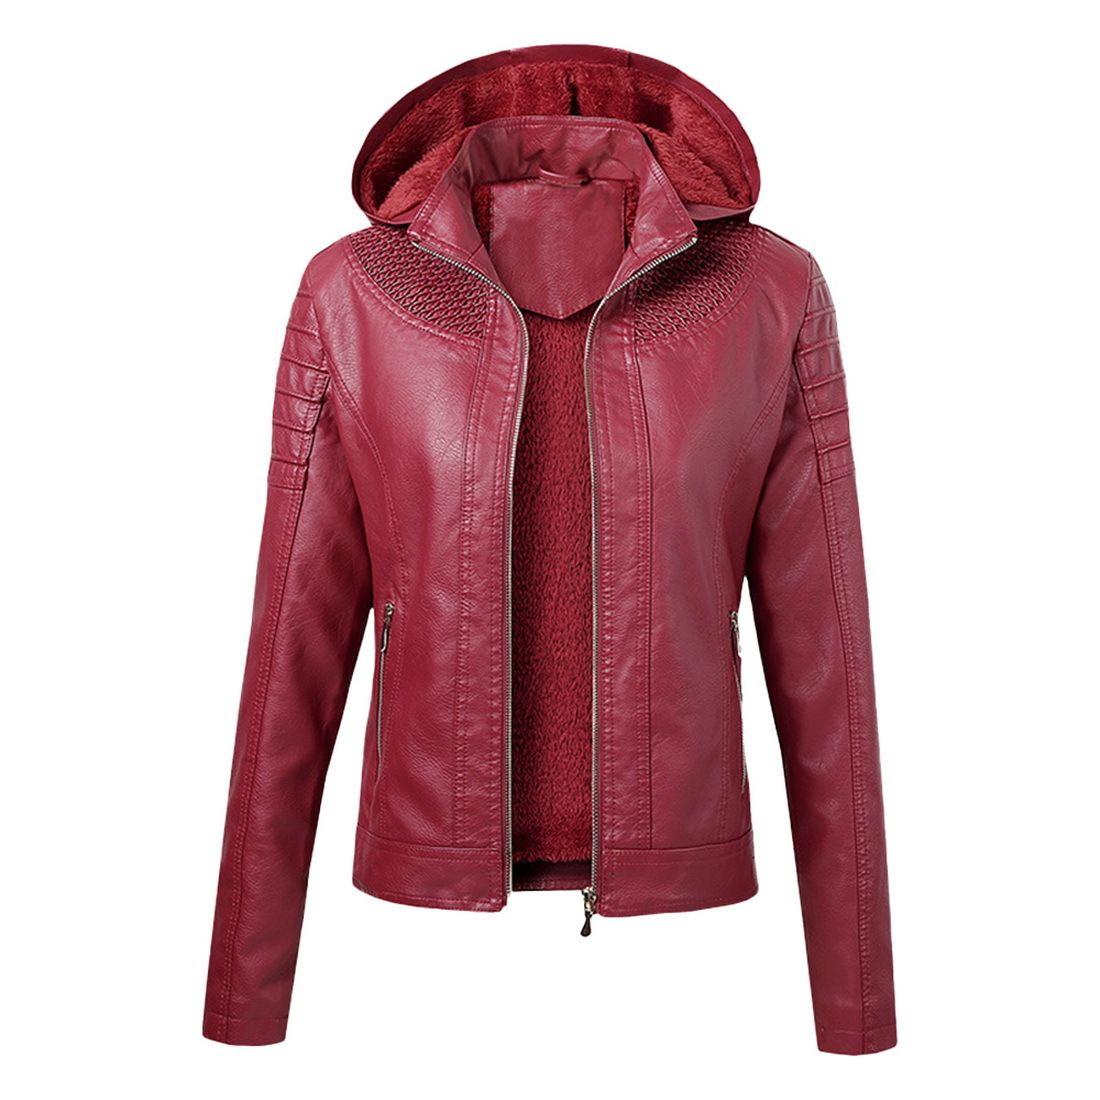 LASPERAL Women Leather Thermal Jacket Plus Velvet Detachable Hooded High-quality New Autumn Winter Women's Jacket 201016